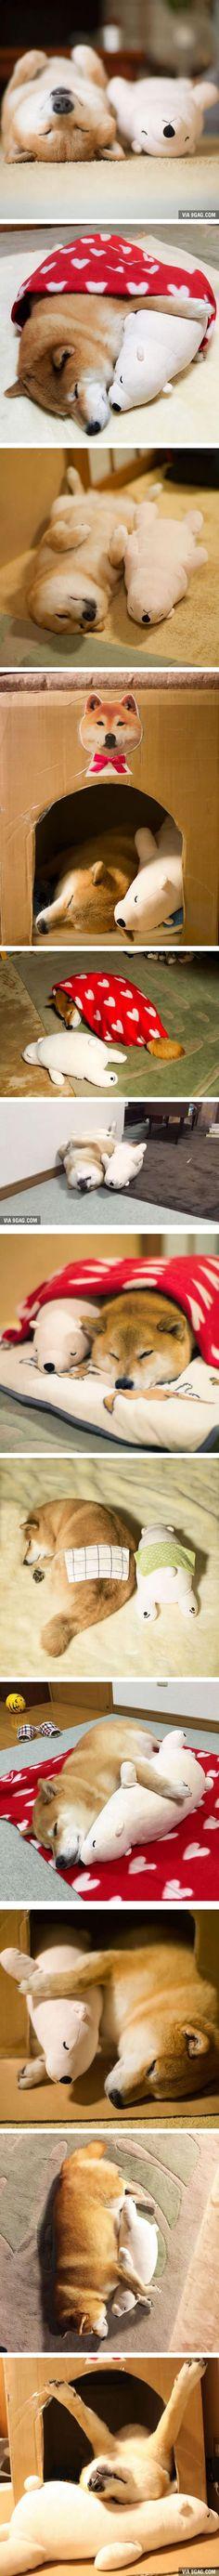 Shiba Inu Maru Loves To Sleep With His Little Stuffed Polar Bear Toy